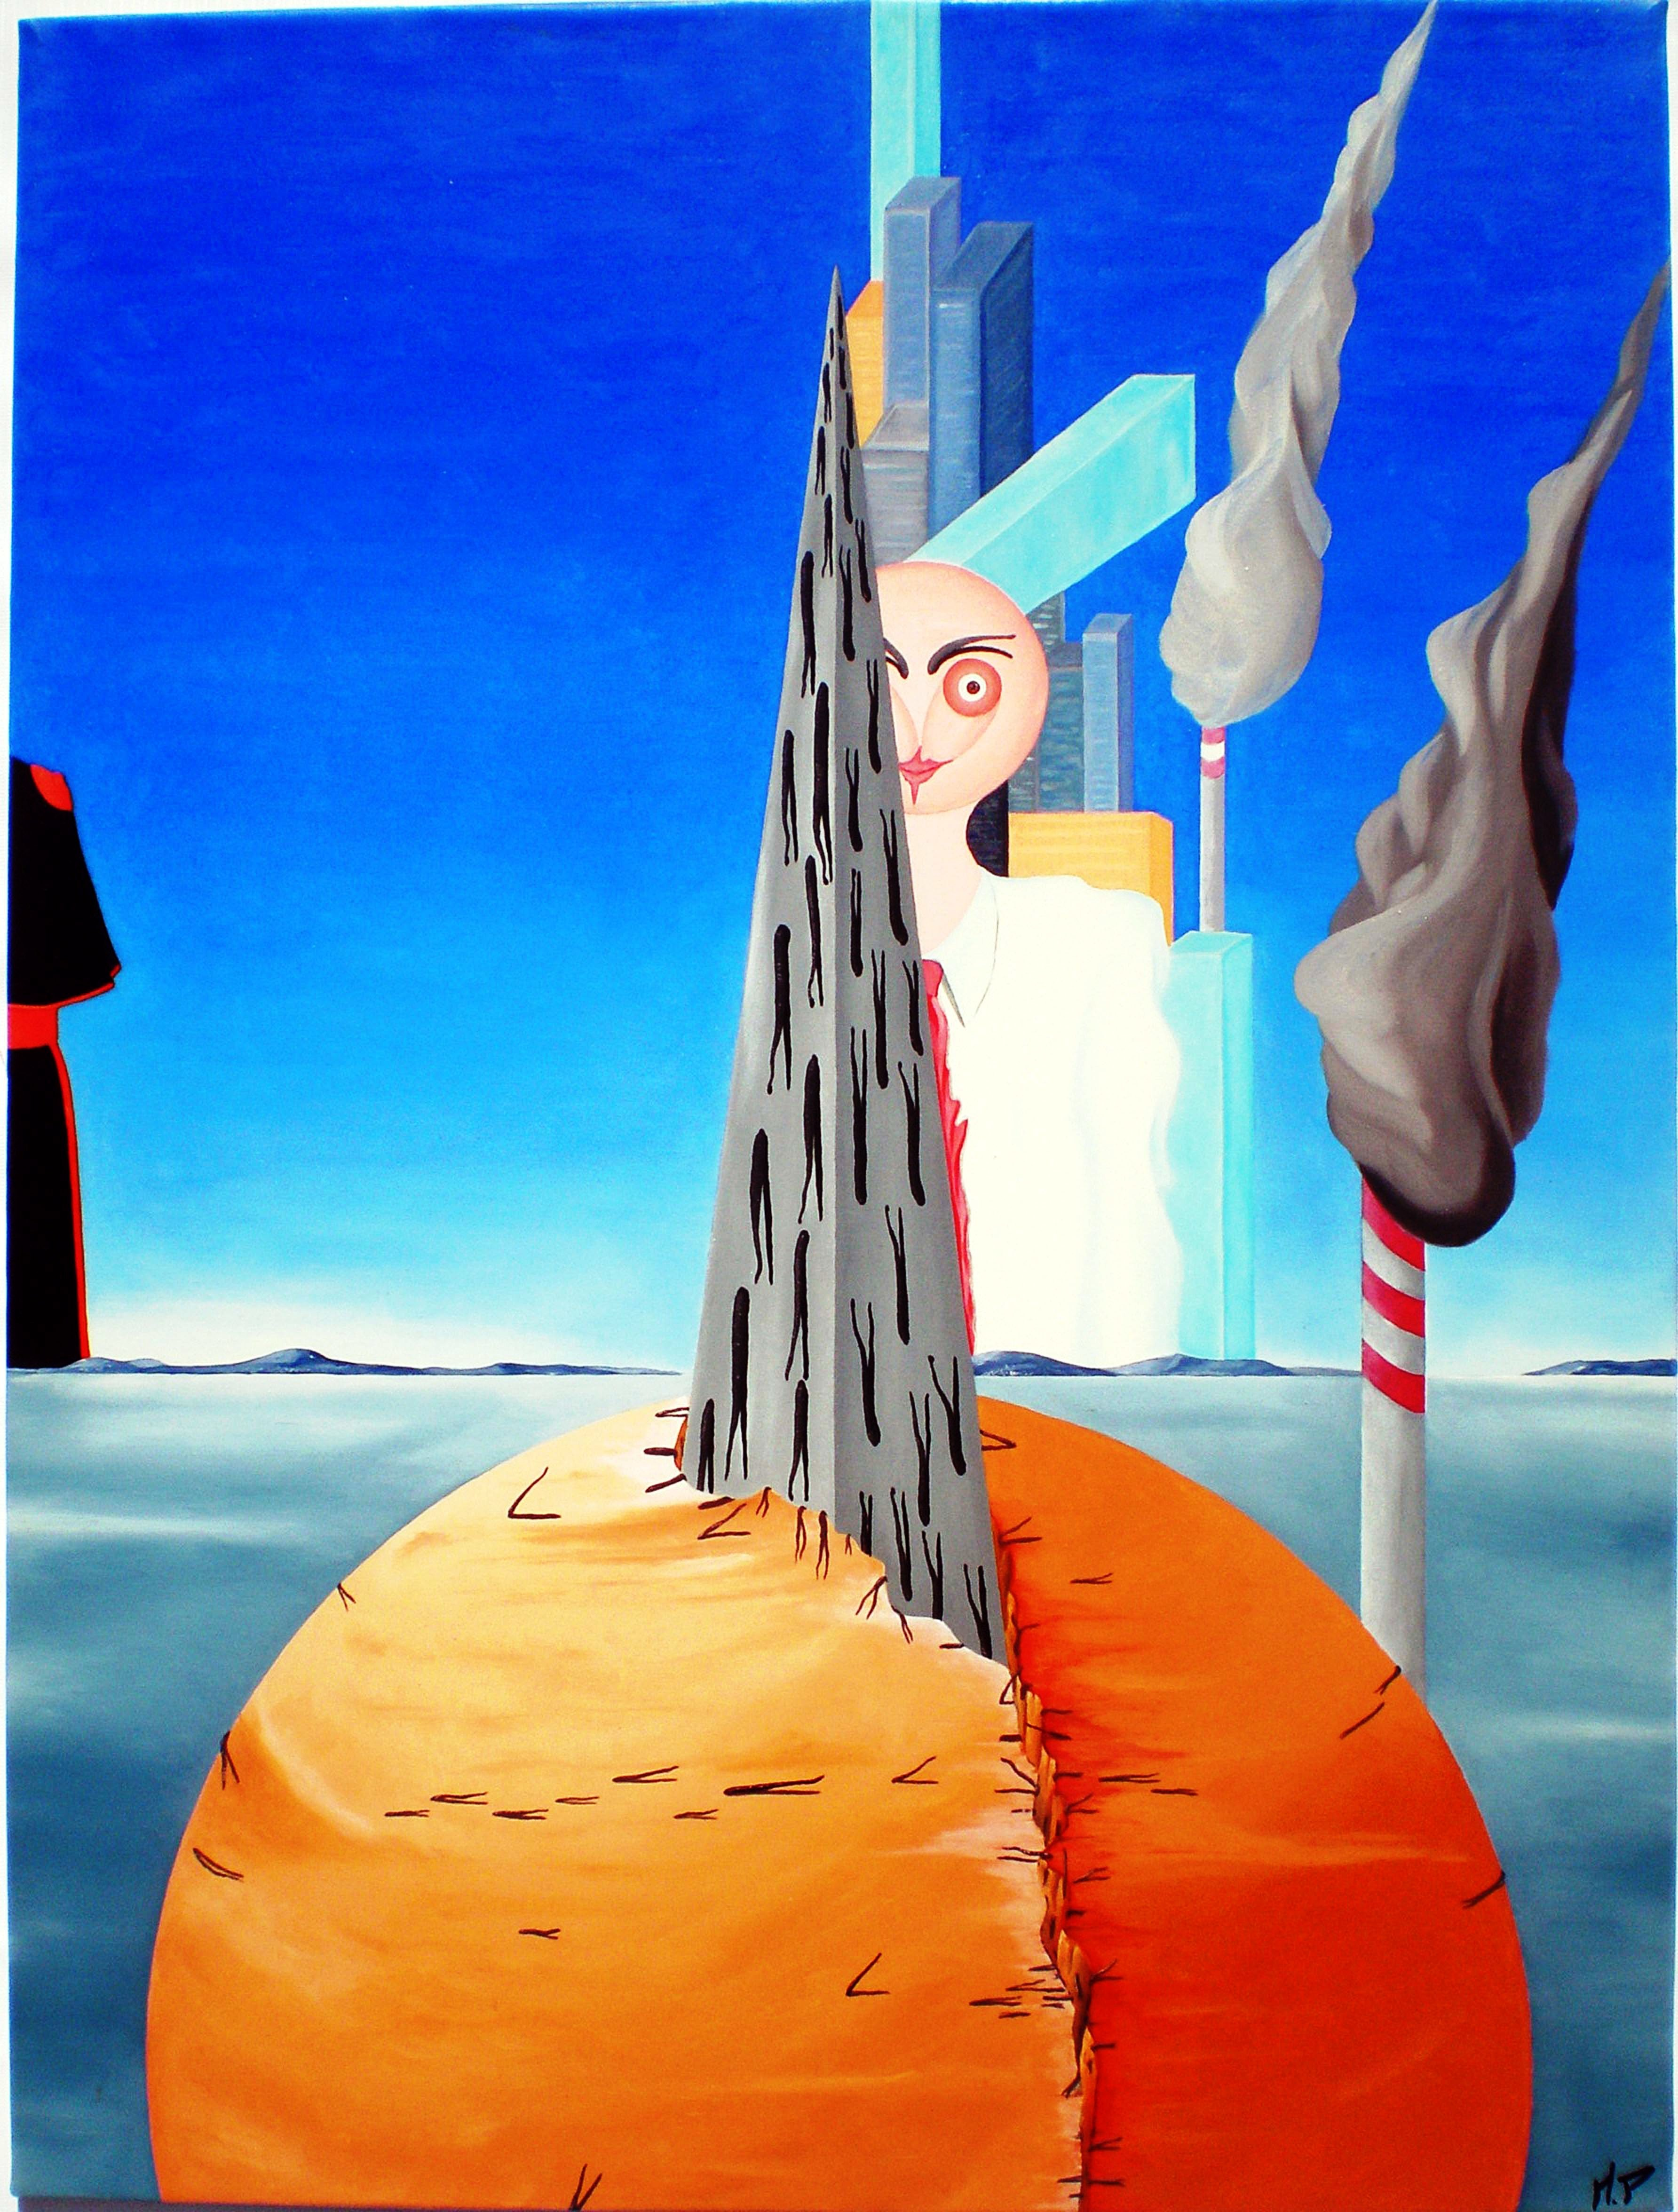 Sacralità violata, olio su tela cm 60x80, Pasquale Mastrogiacomo Acerno (SA)